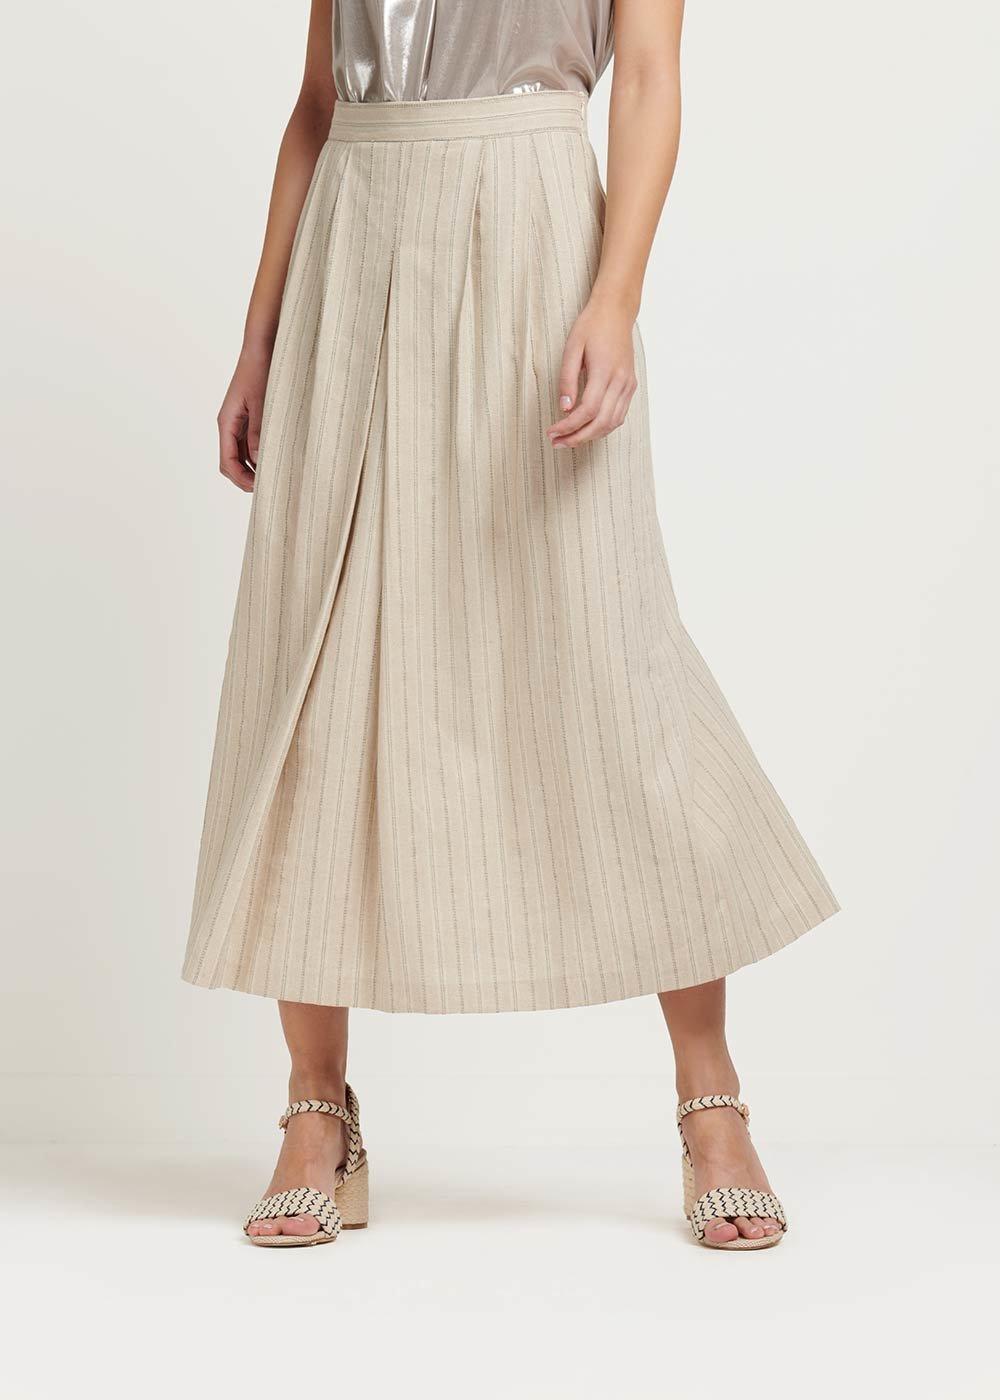 Gioia pinstriped skirt - Beige \ Silver Stripes - Woman